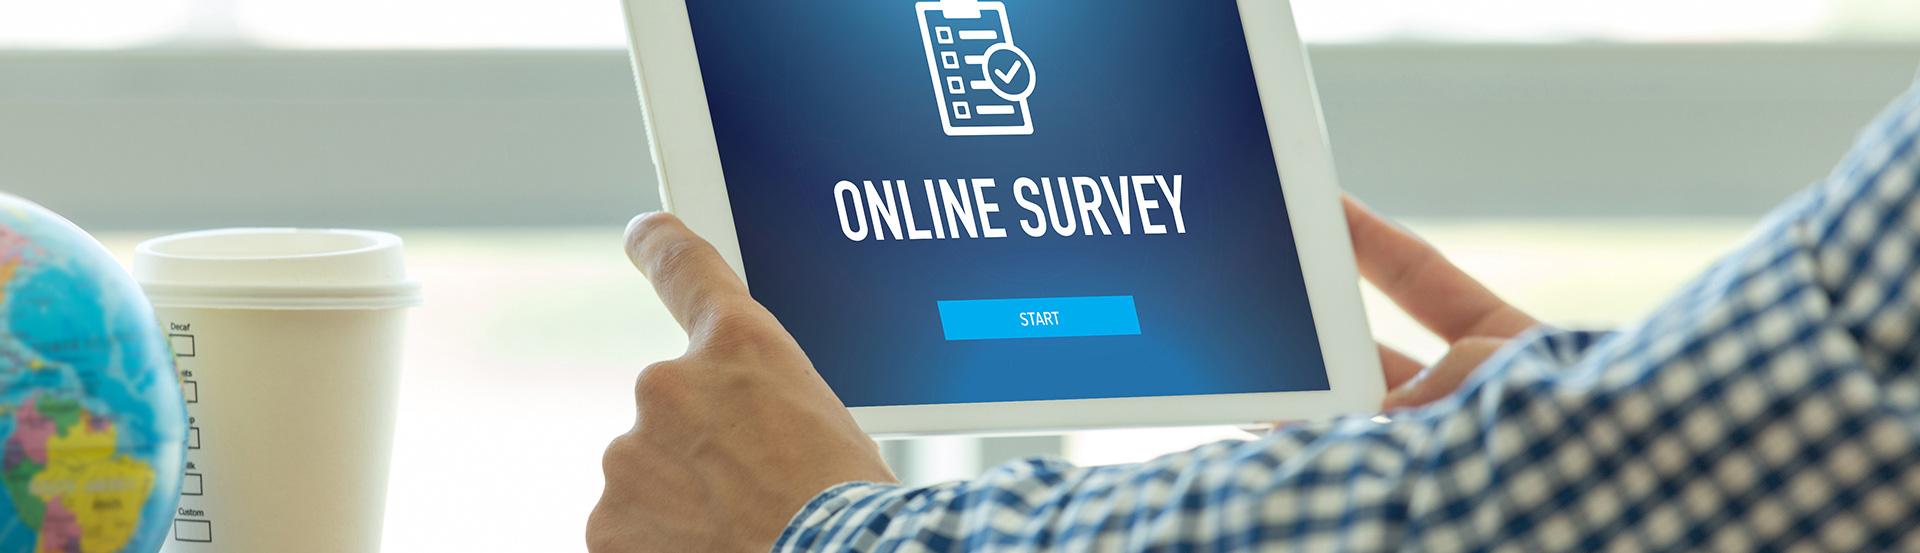 Phrasing online questionnaire